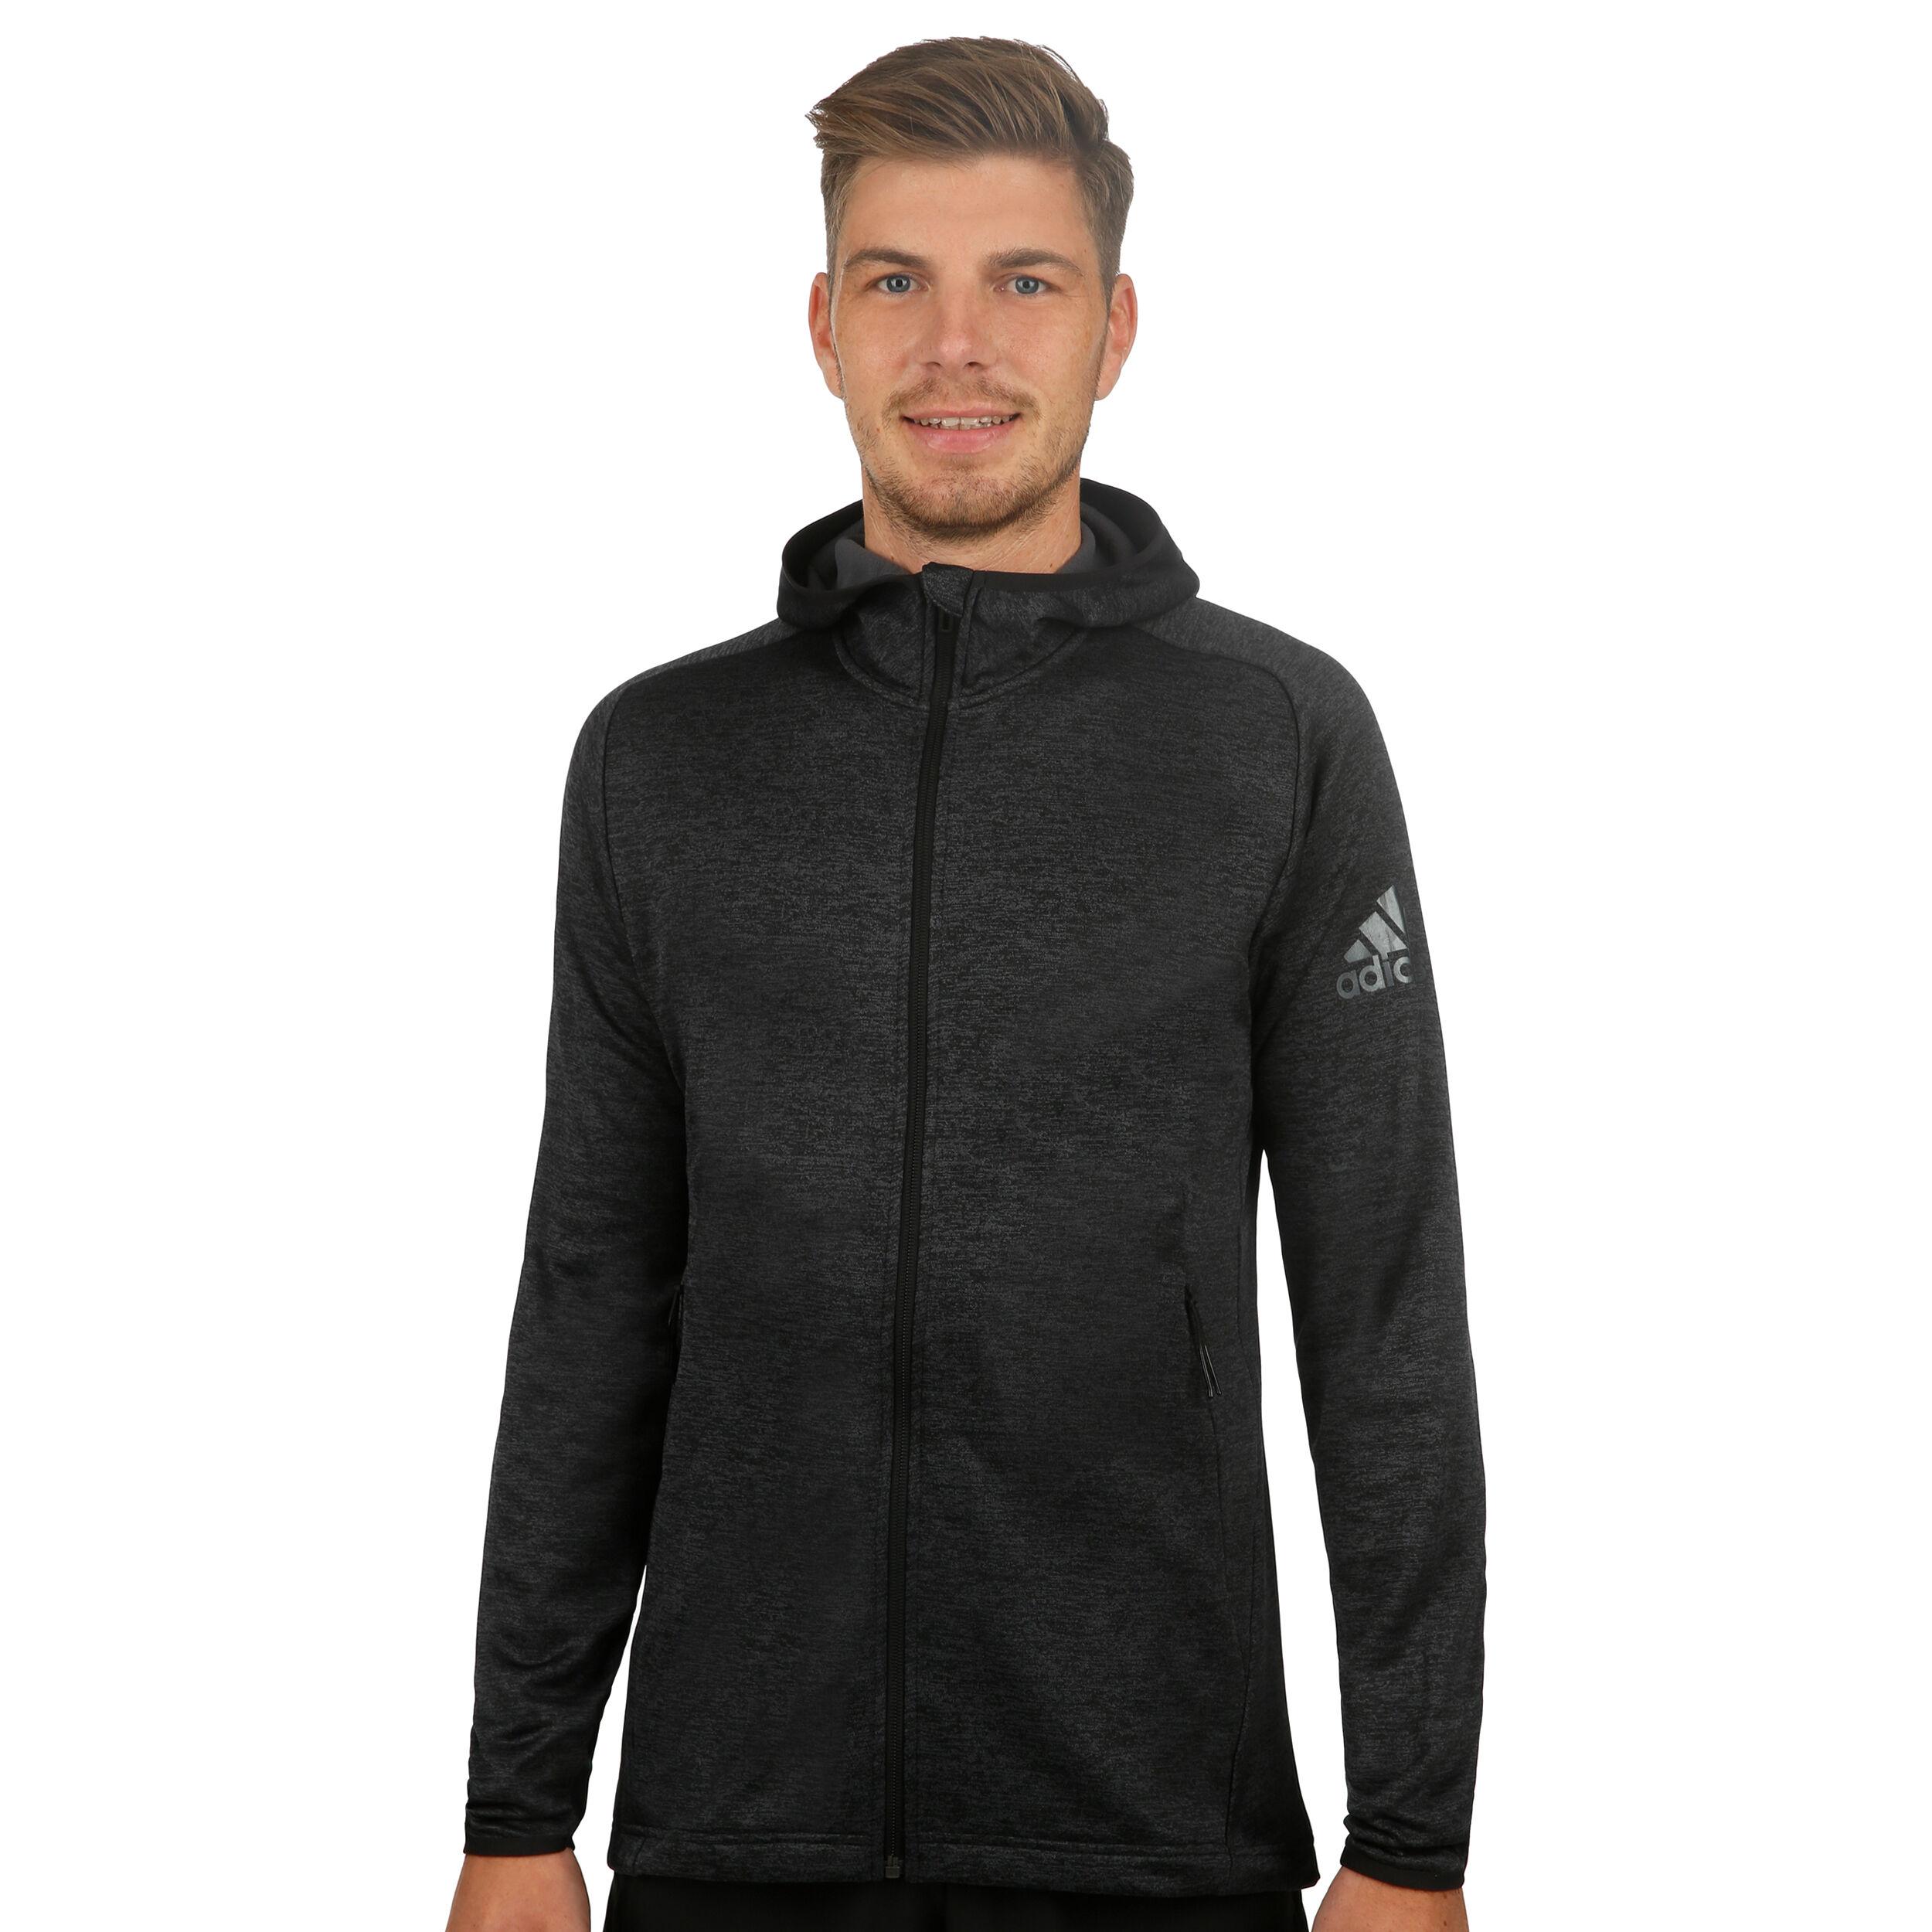 adidas FreeLift Climawarm Kapuzenjacke Herren carbon black